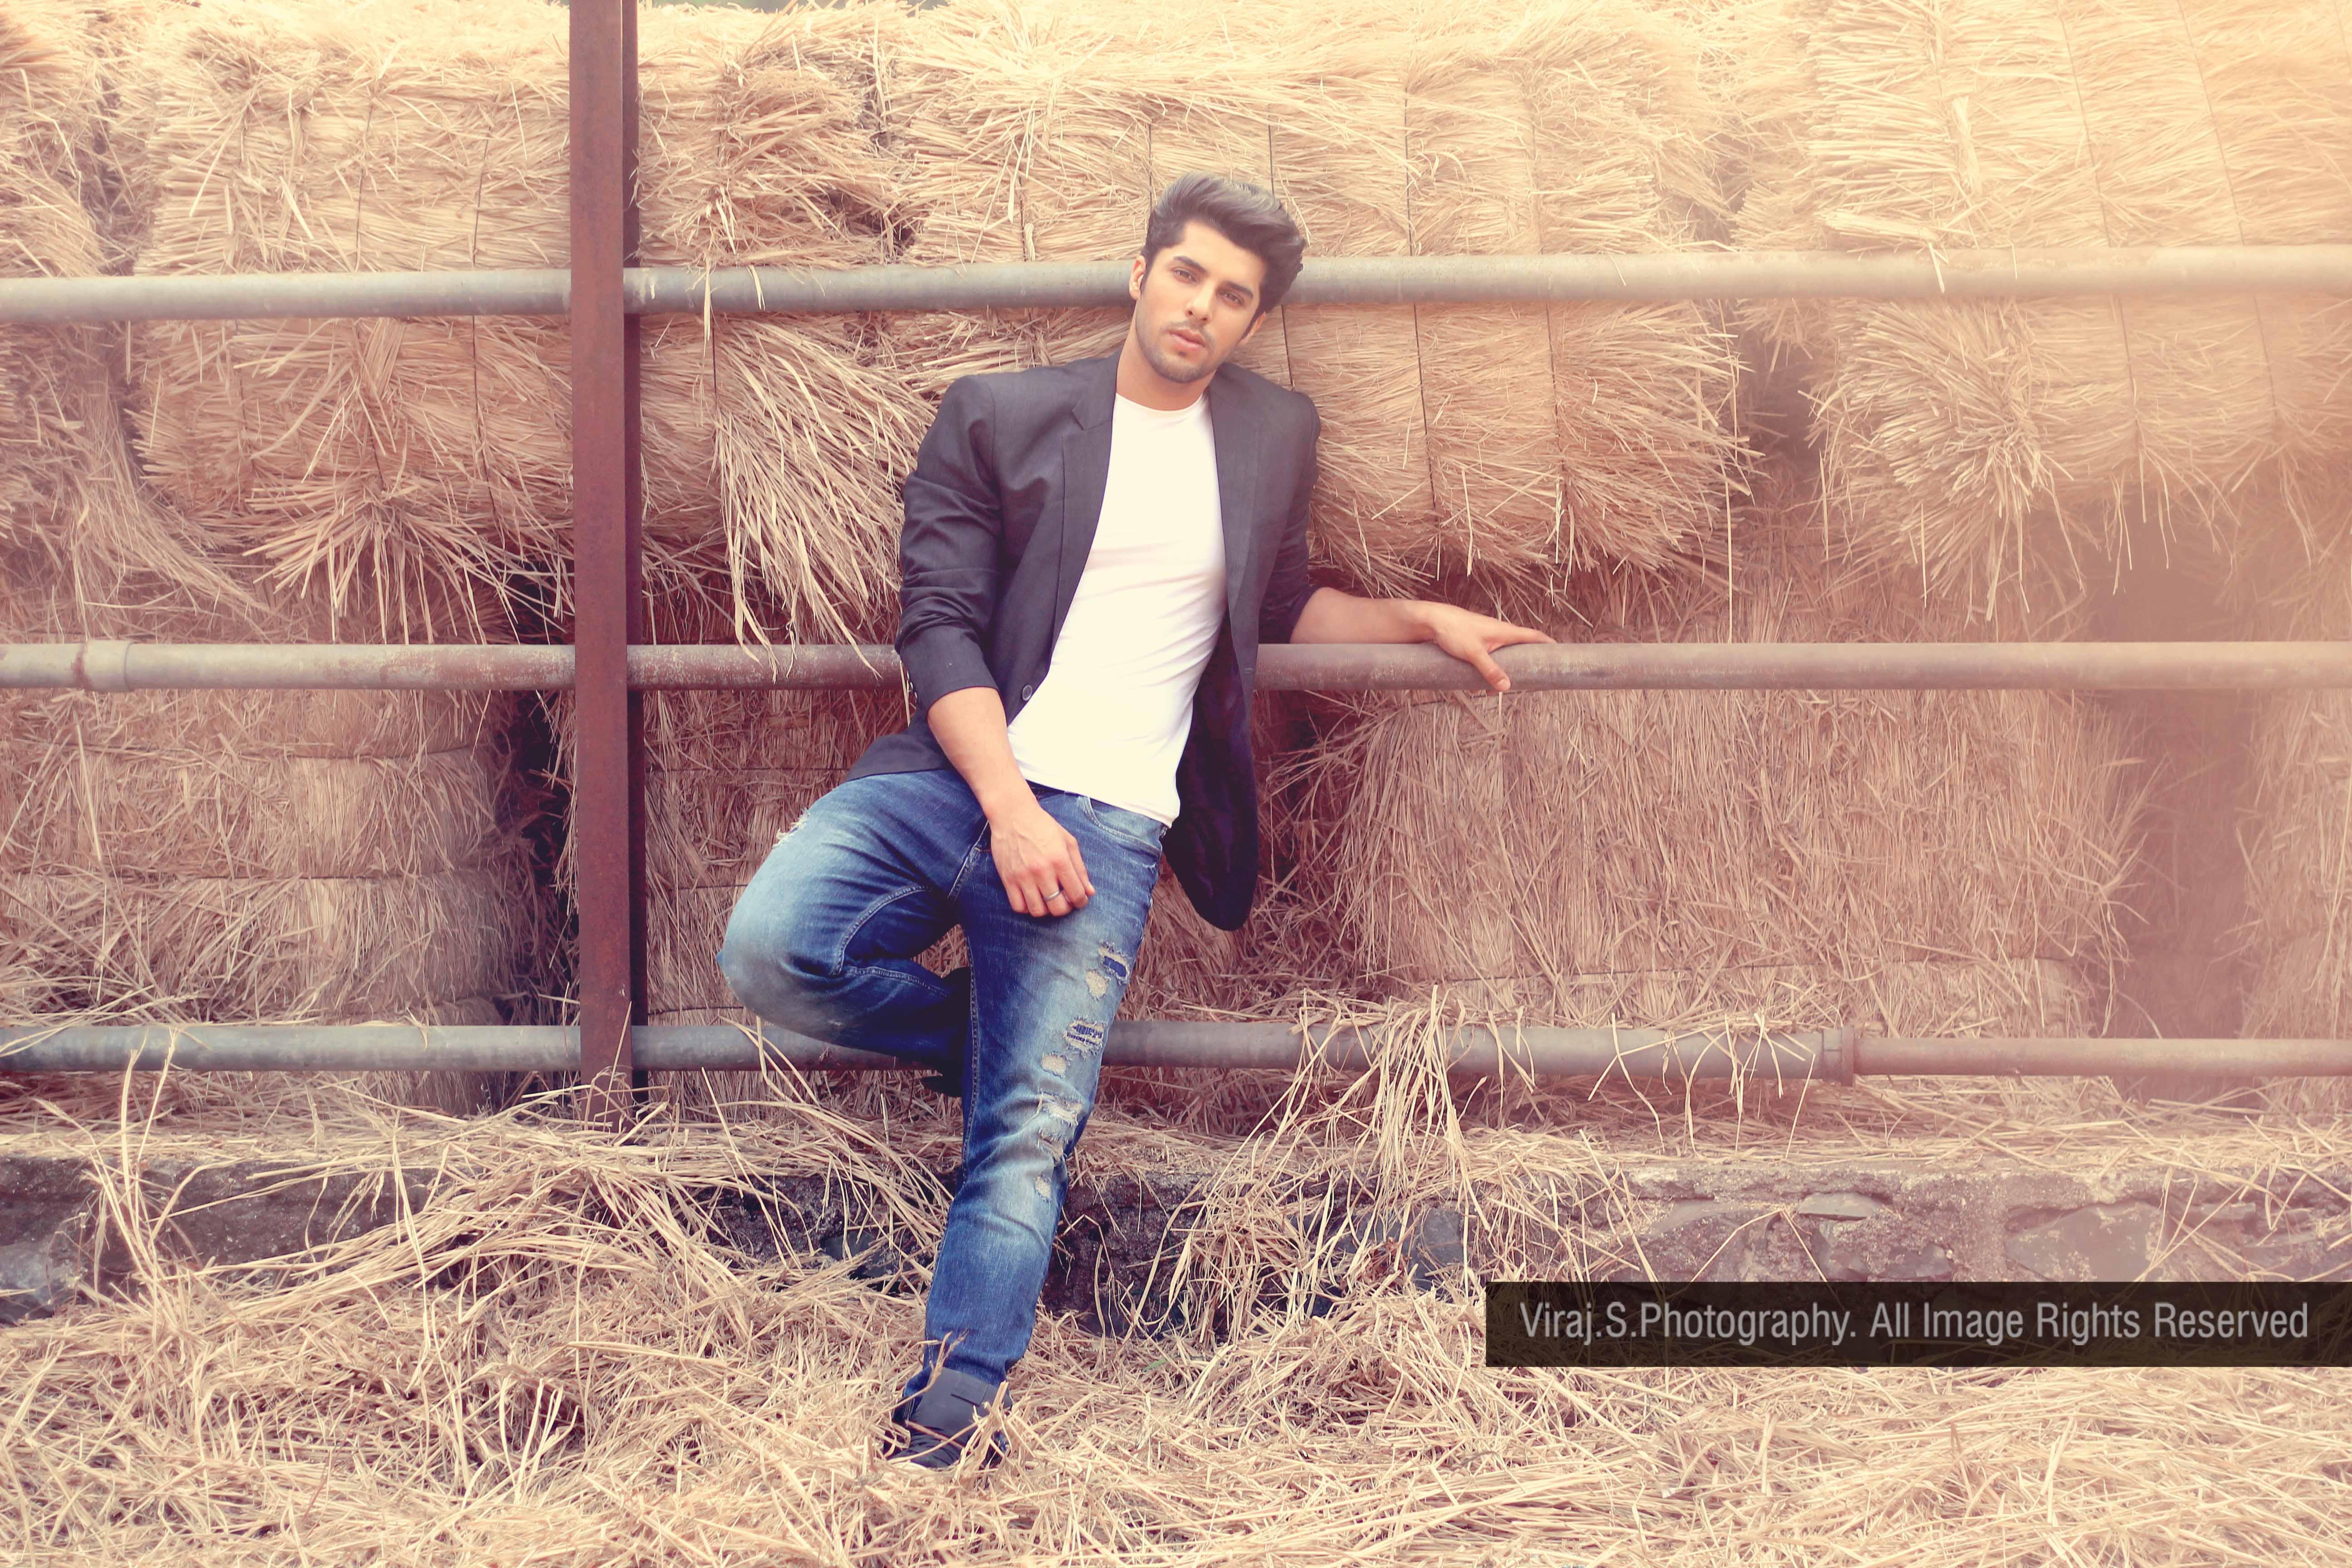 Guru_virajsphotography